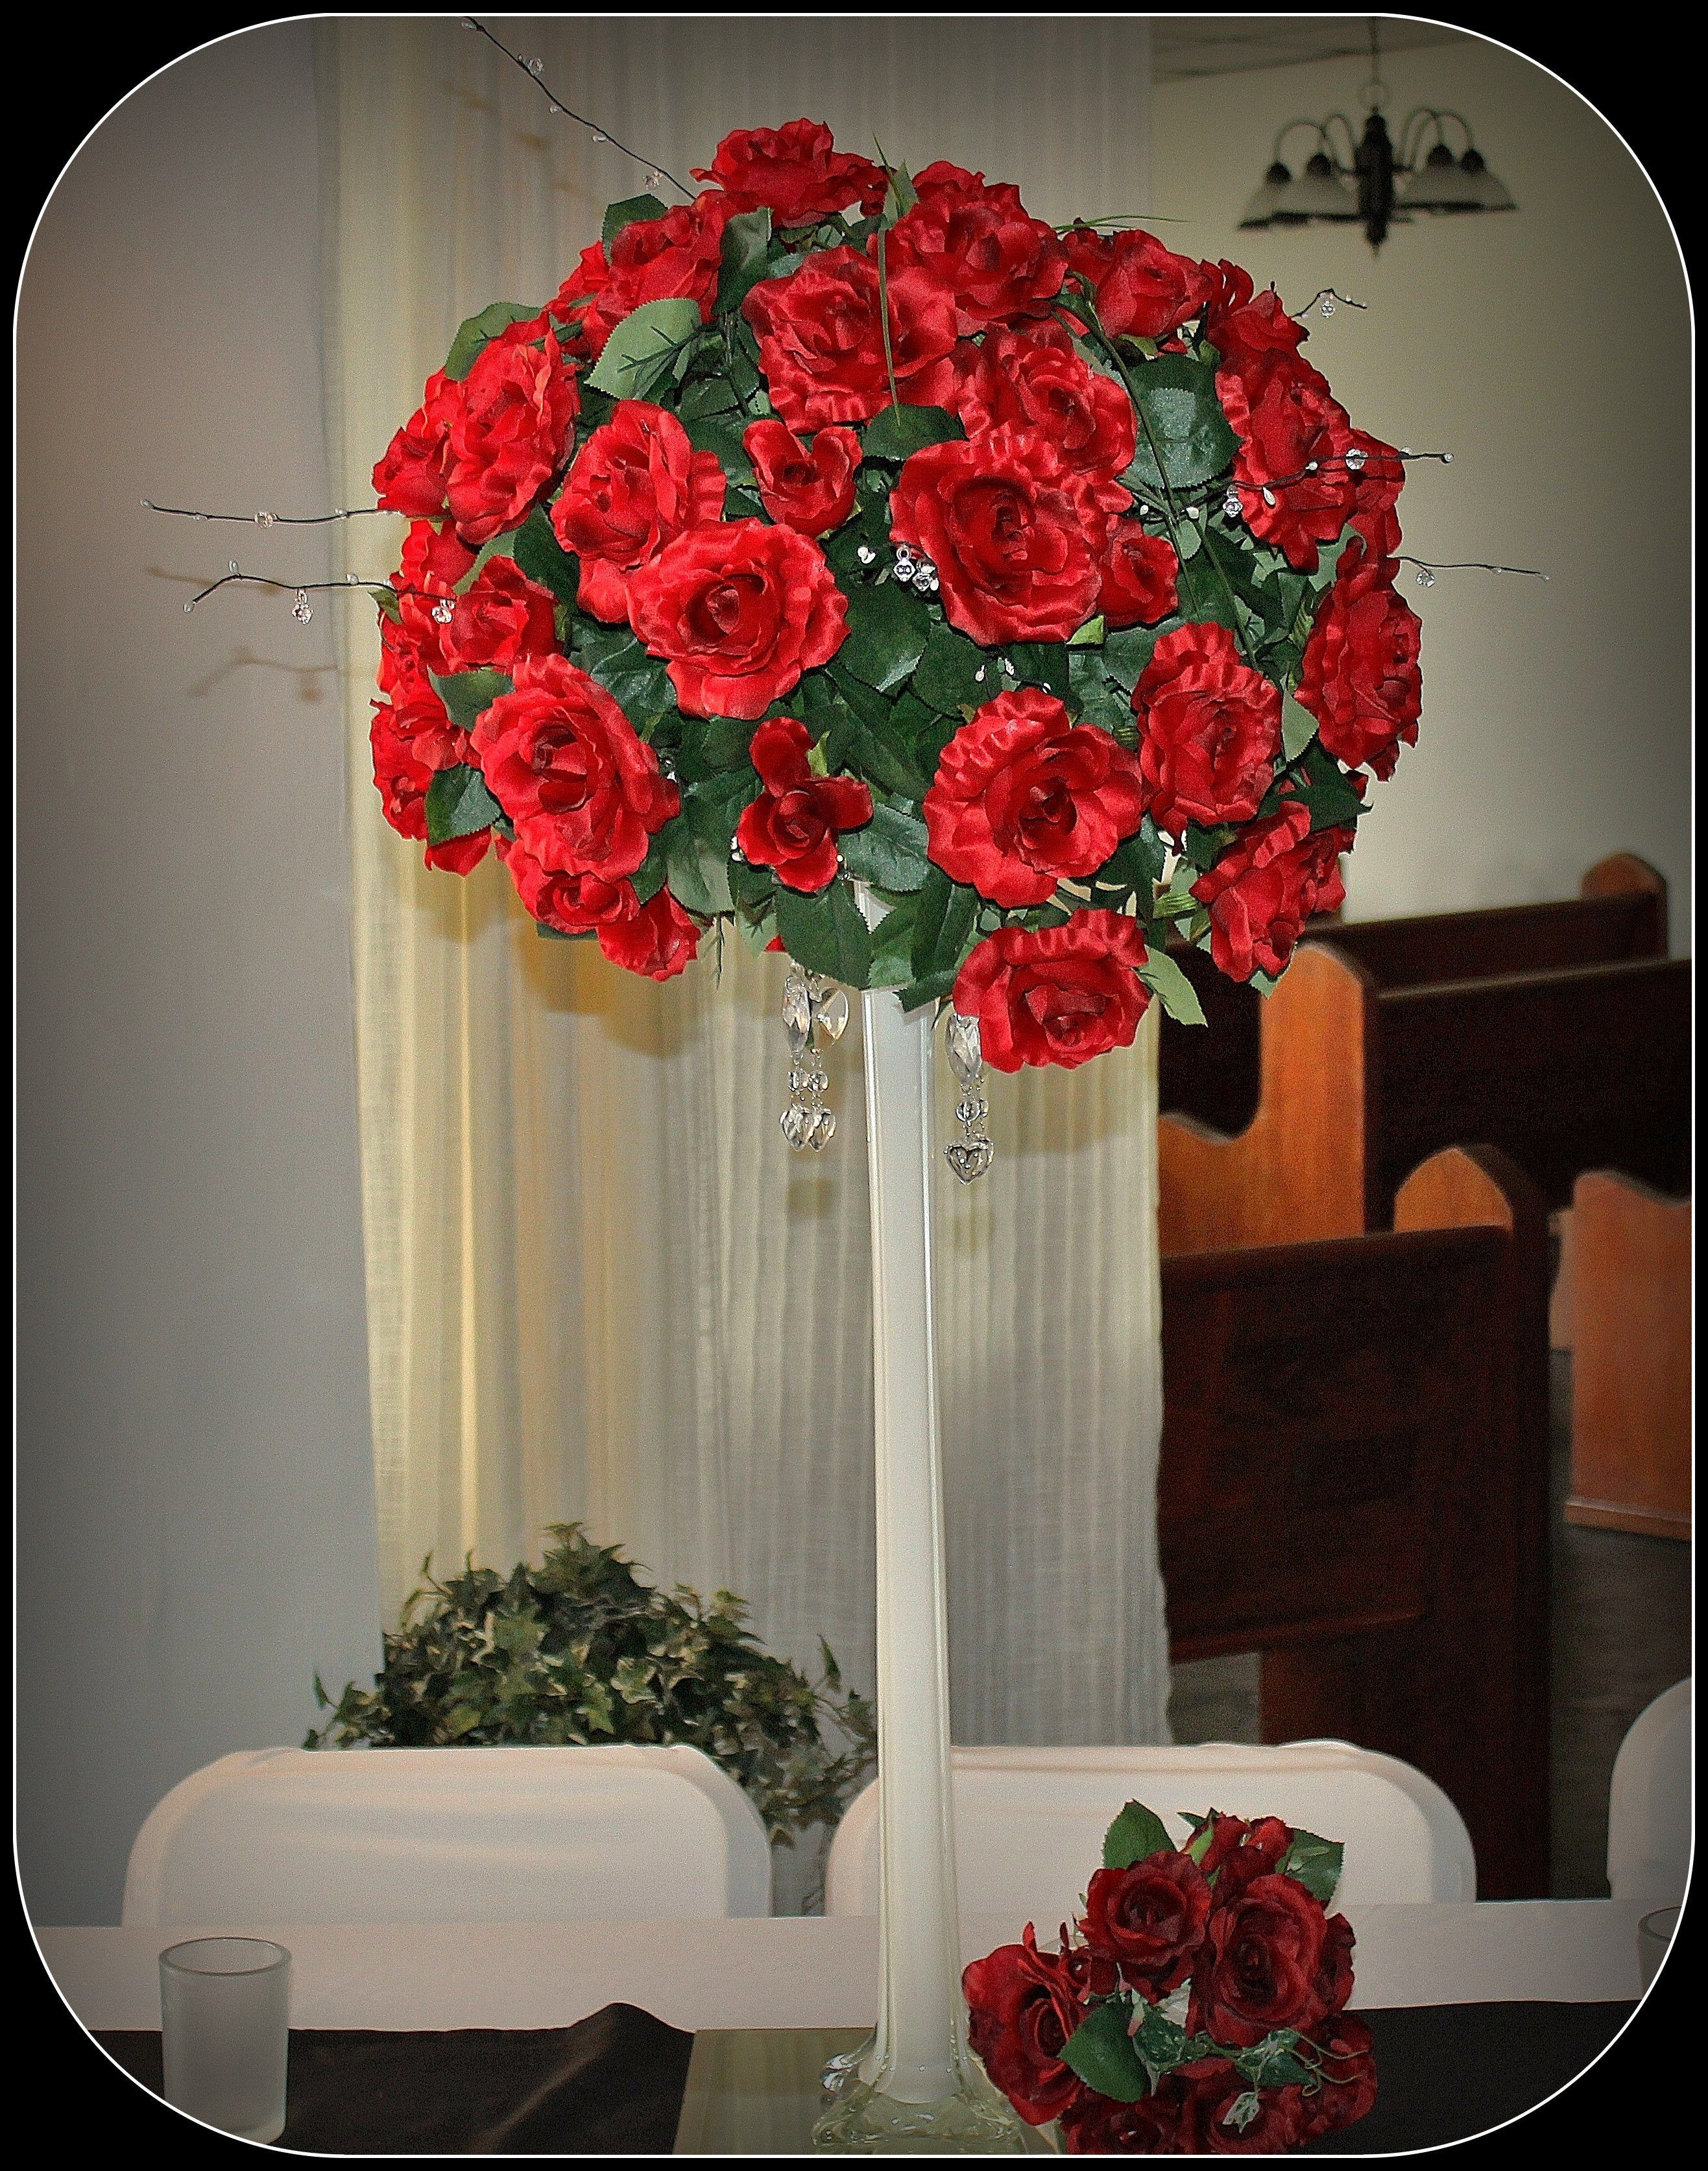 plastic eiffel tower vases of eiffel tower vase centerpieces elegant red eiffel tower vase the with regard to eiffel tower vase centerpieces elegant red eiffel tower vase